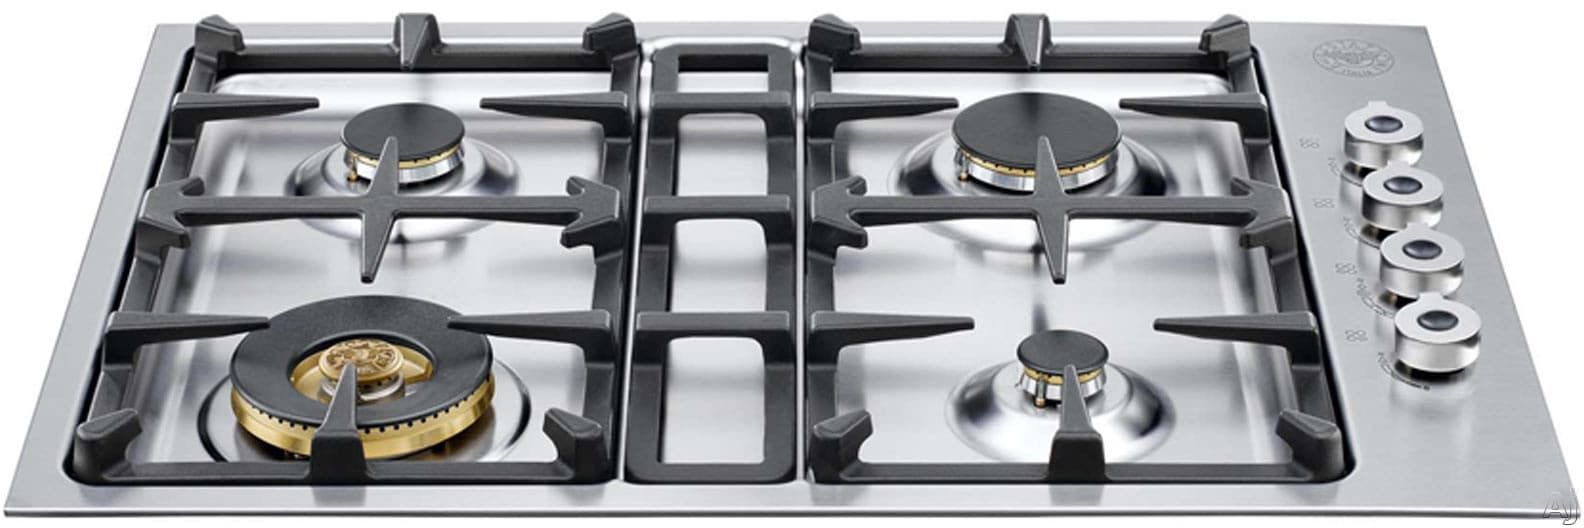 Bertazzoni Professional Series Qb30400x Gas Cooktop Cooktop Single Burner Propane Stove